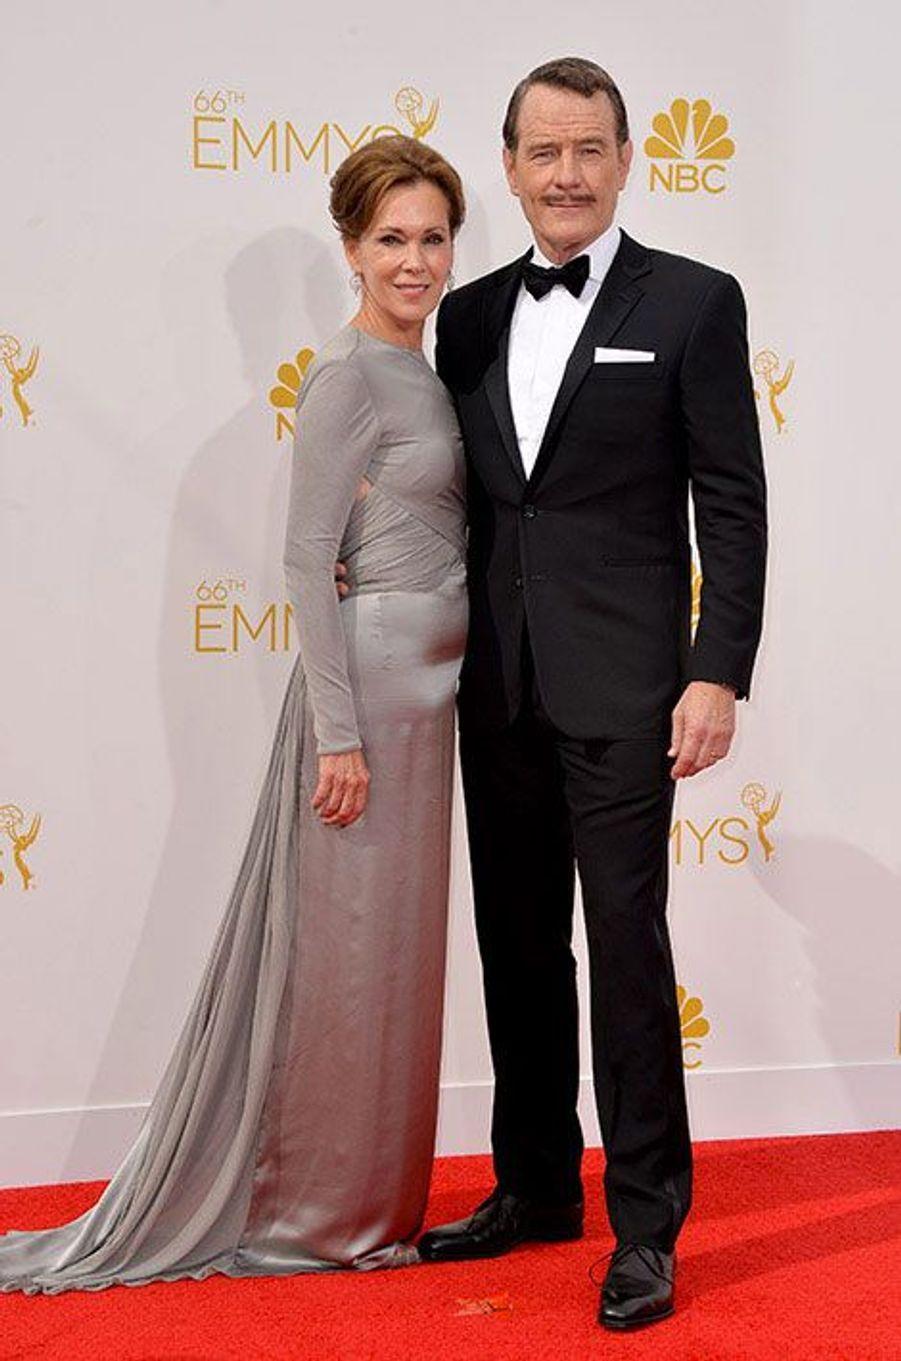 Robin Dearden et Bryan Cranston aux Emmy Awards 2014